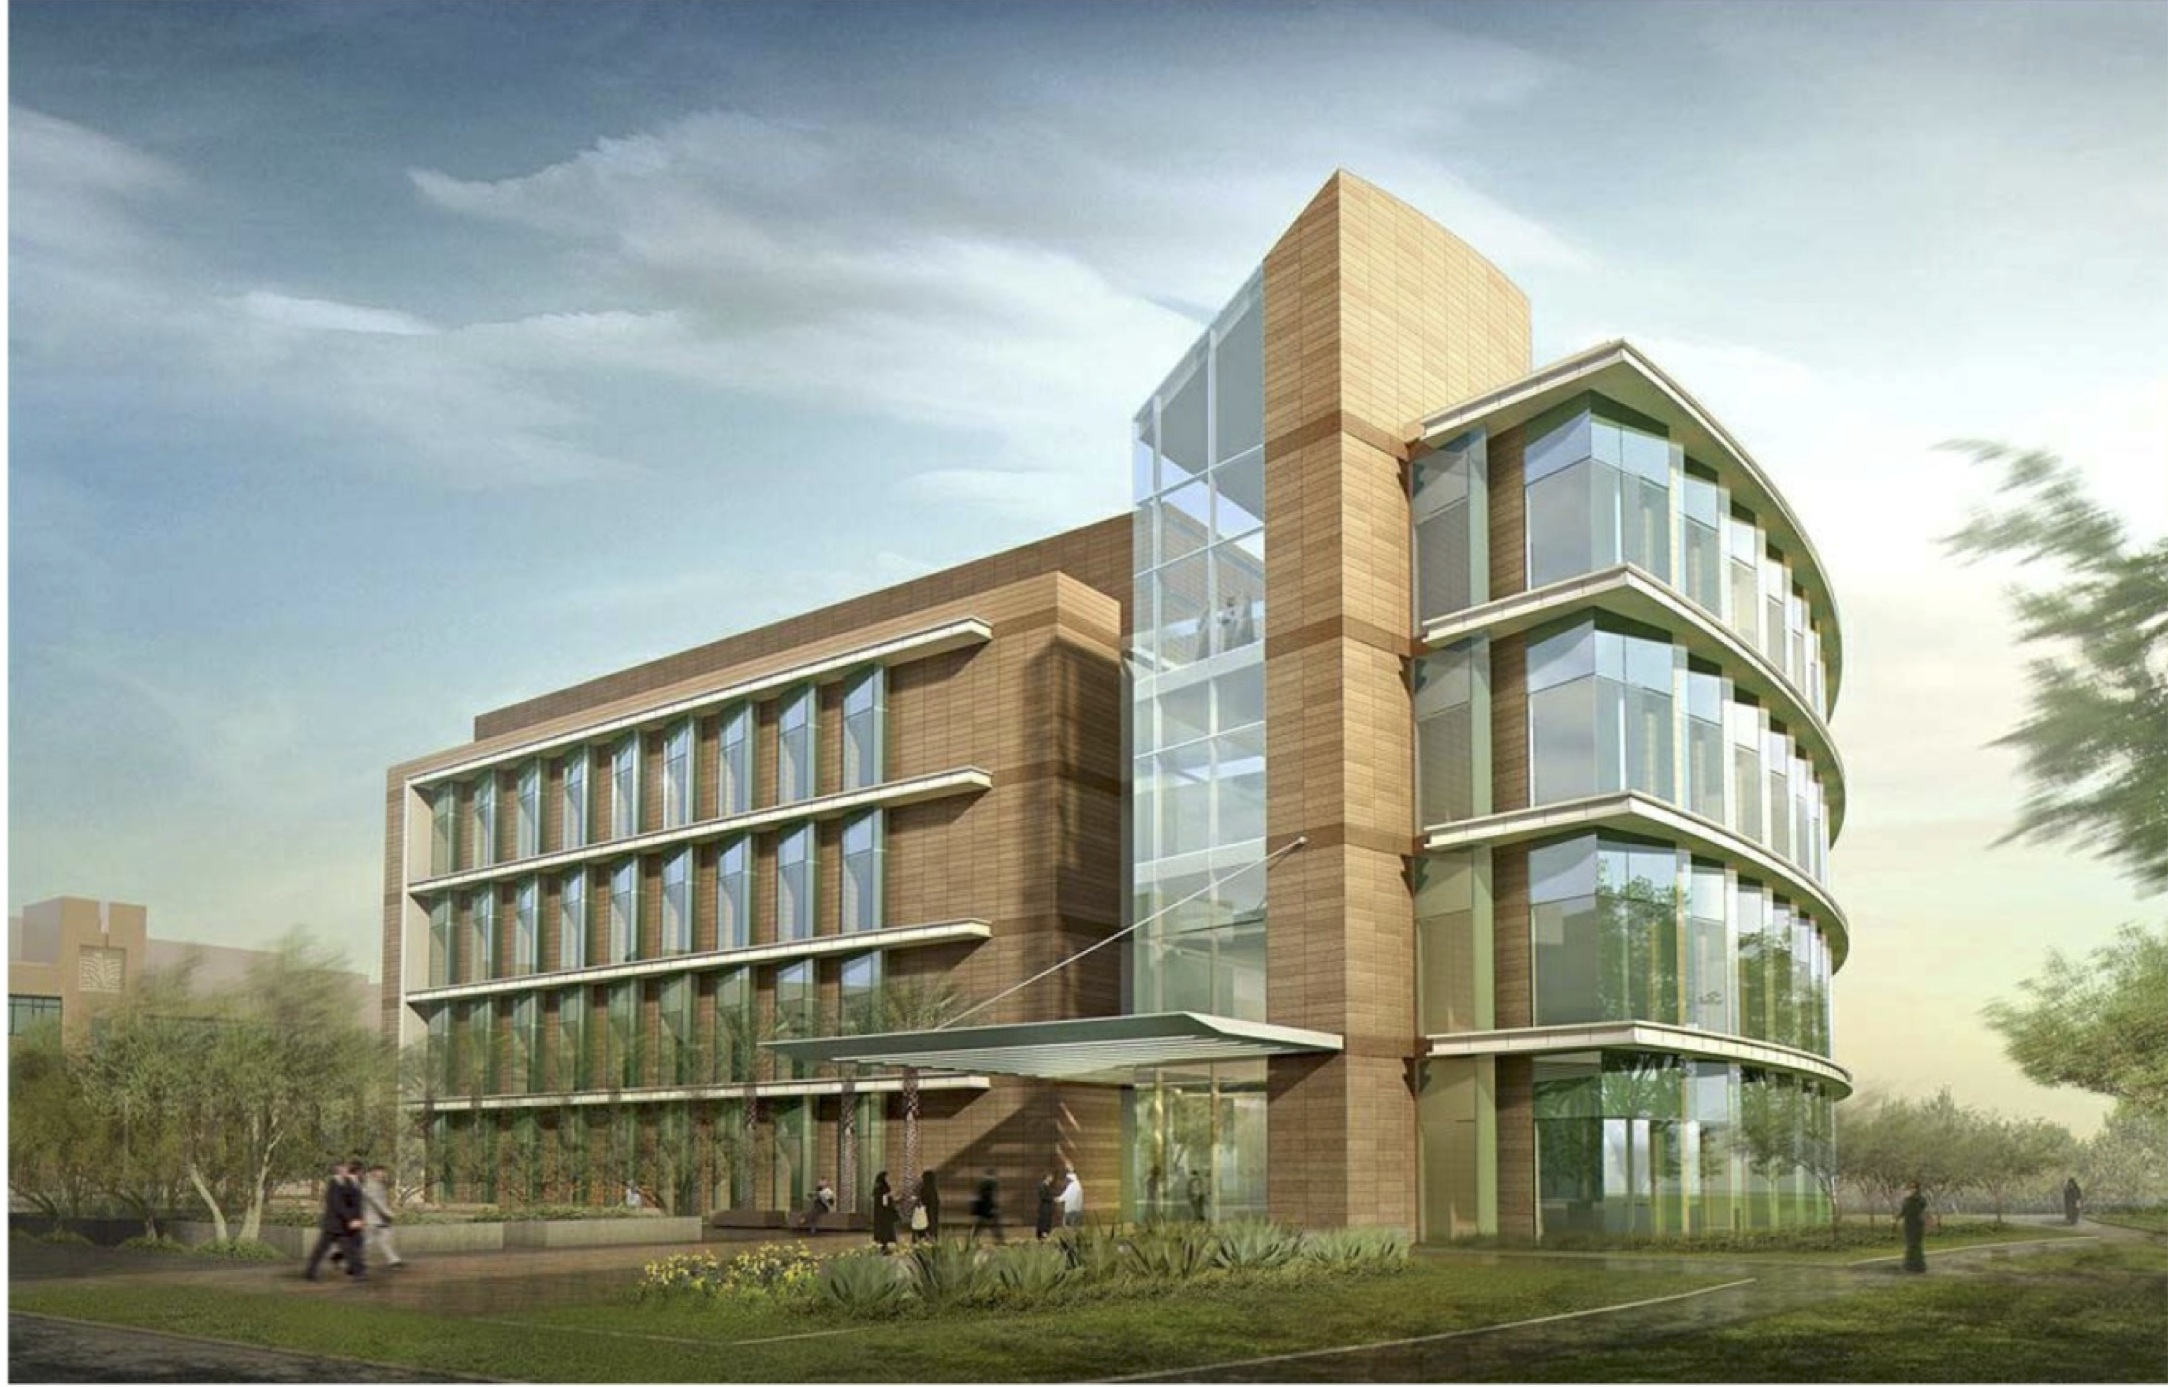 UAE University Interdisciplinary Research Lab, Al Ain, Abu Dhabi